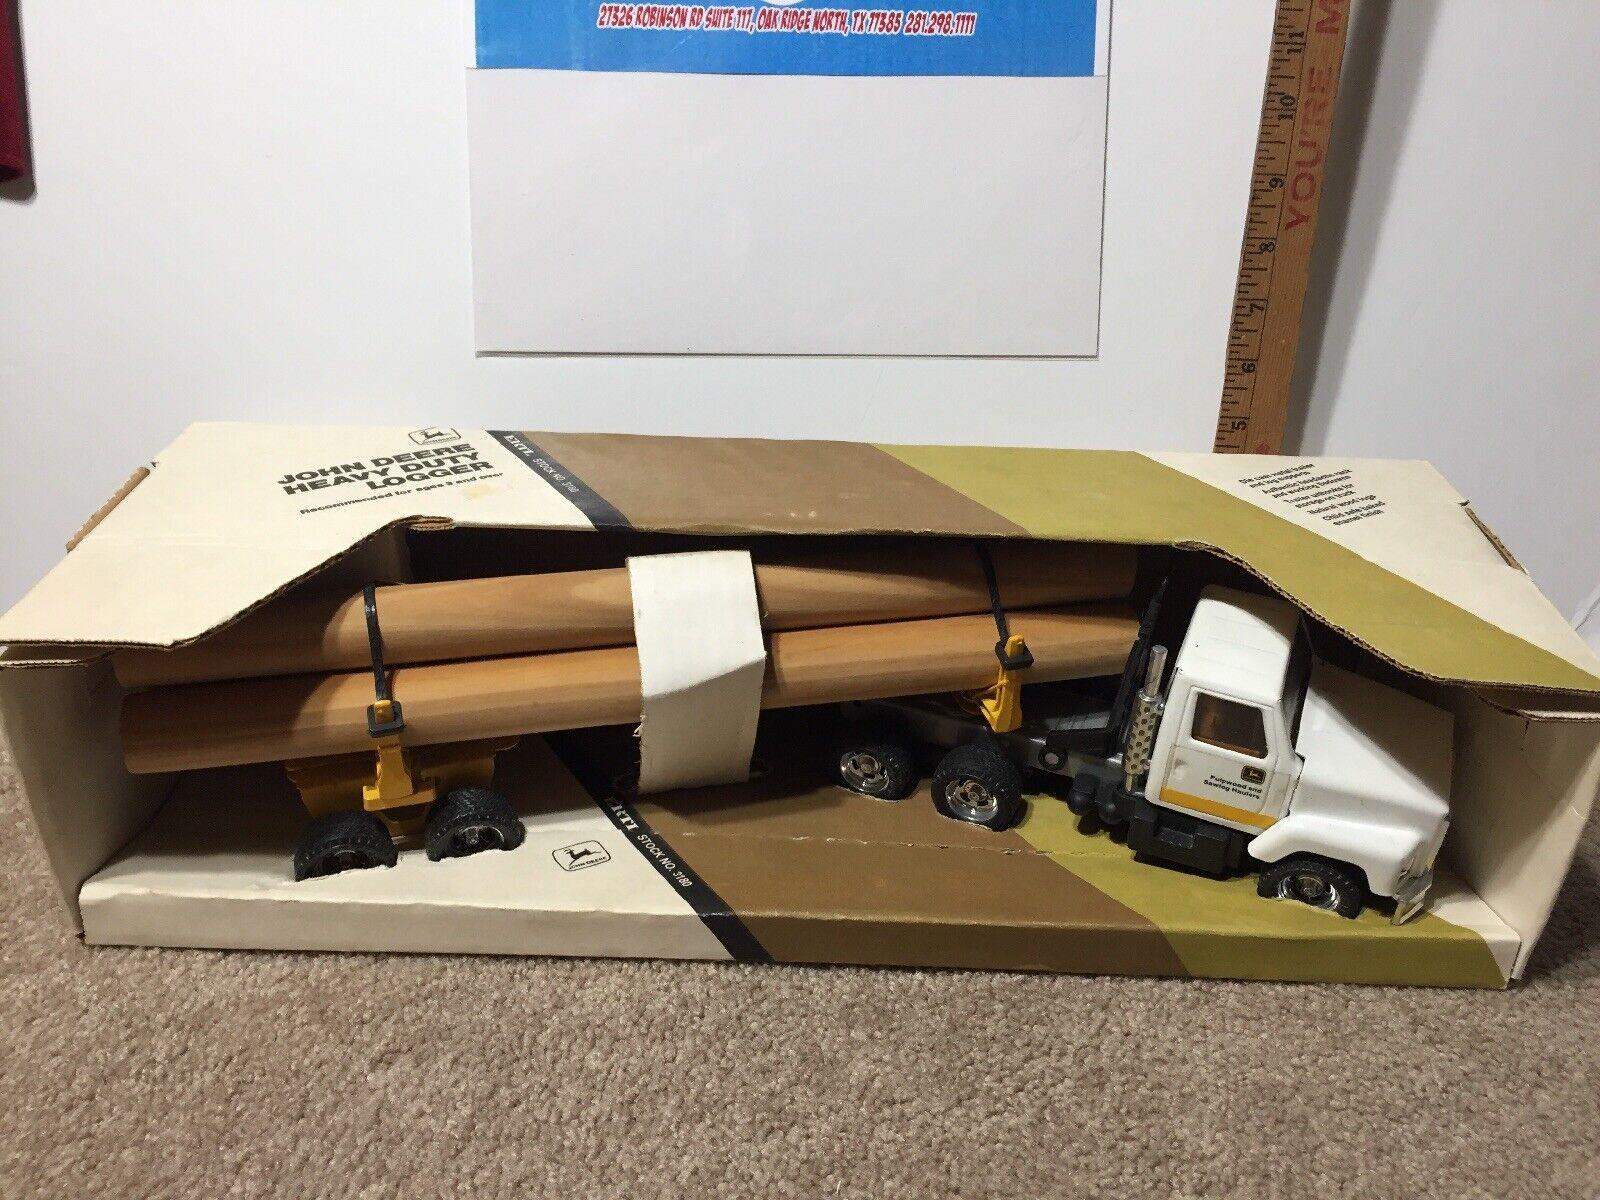 Ertl Semi Truck And Trailer John Deere Heavy Duty Logger 3180 Diecast